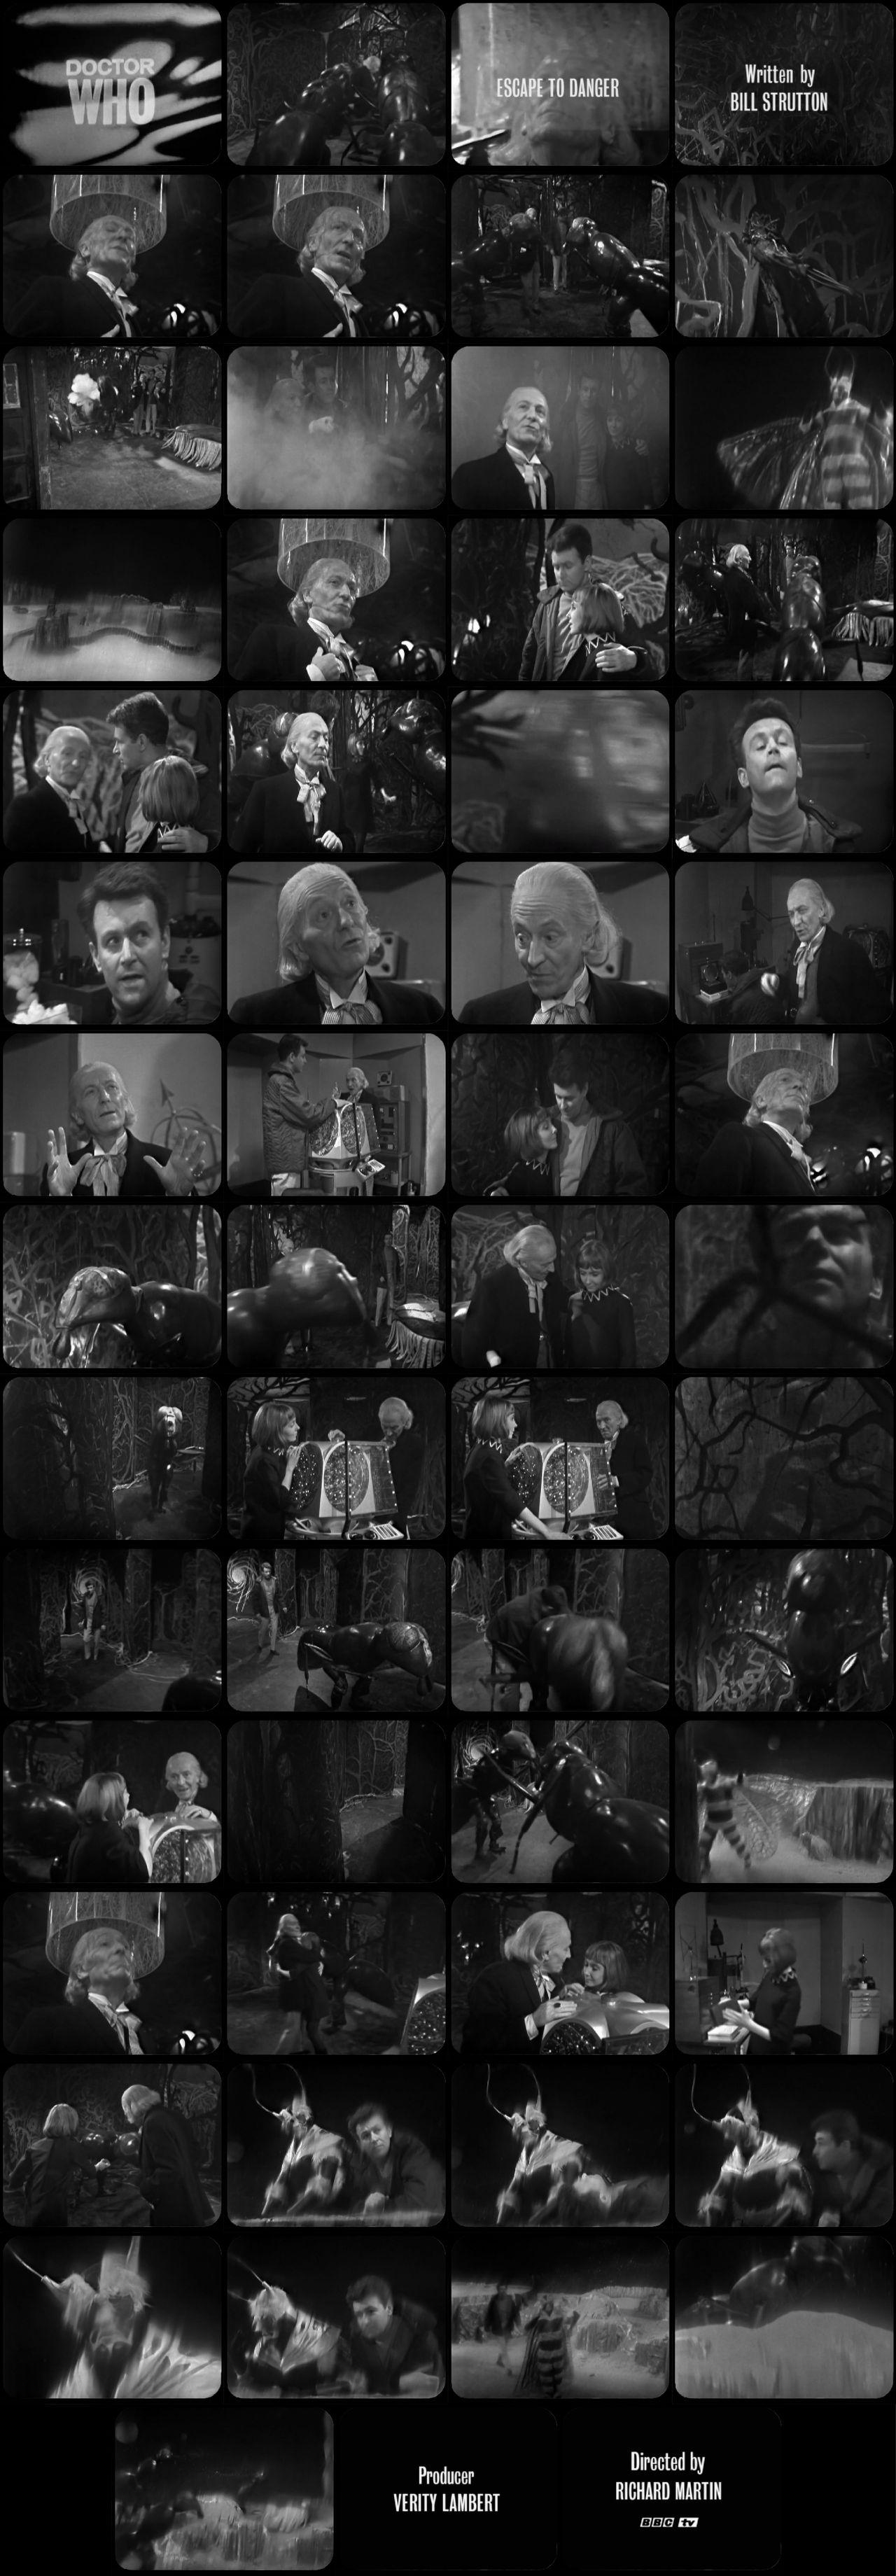 The Web Planet Episode 3 Tele-Snaps